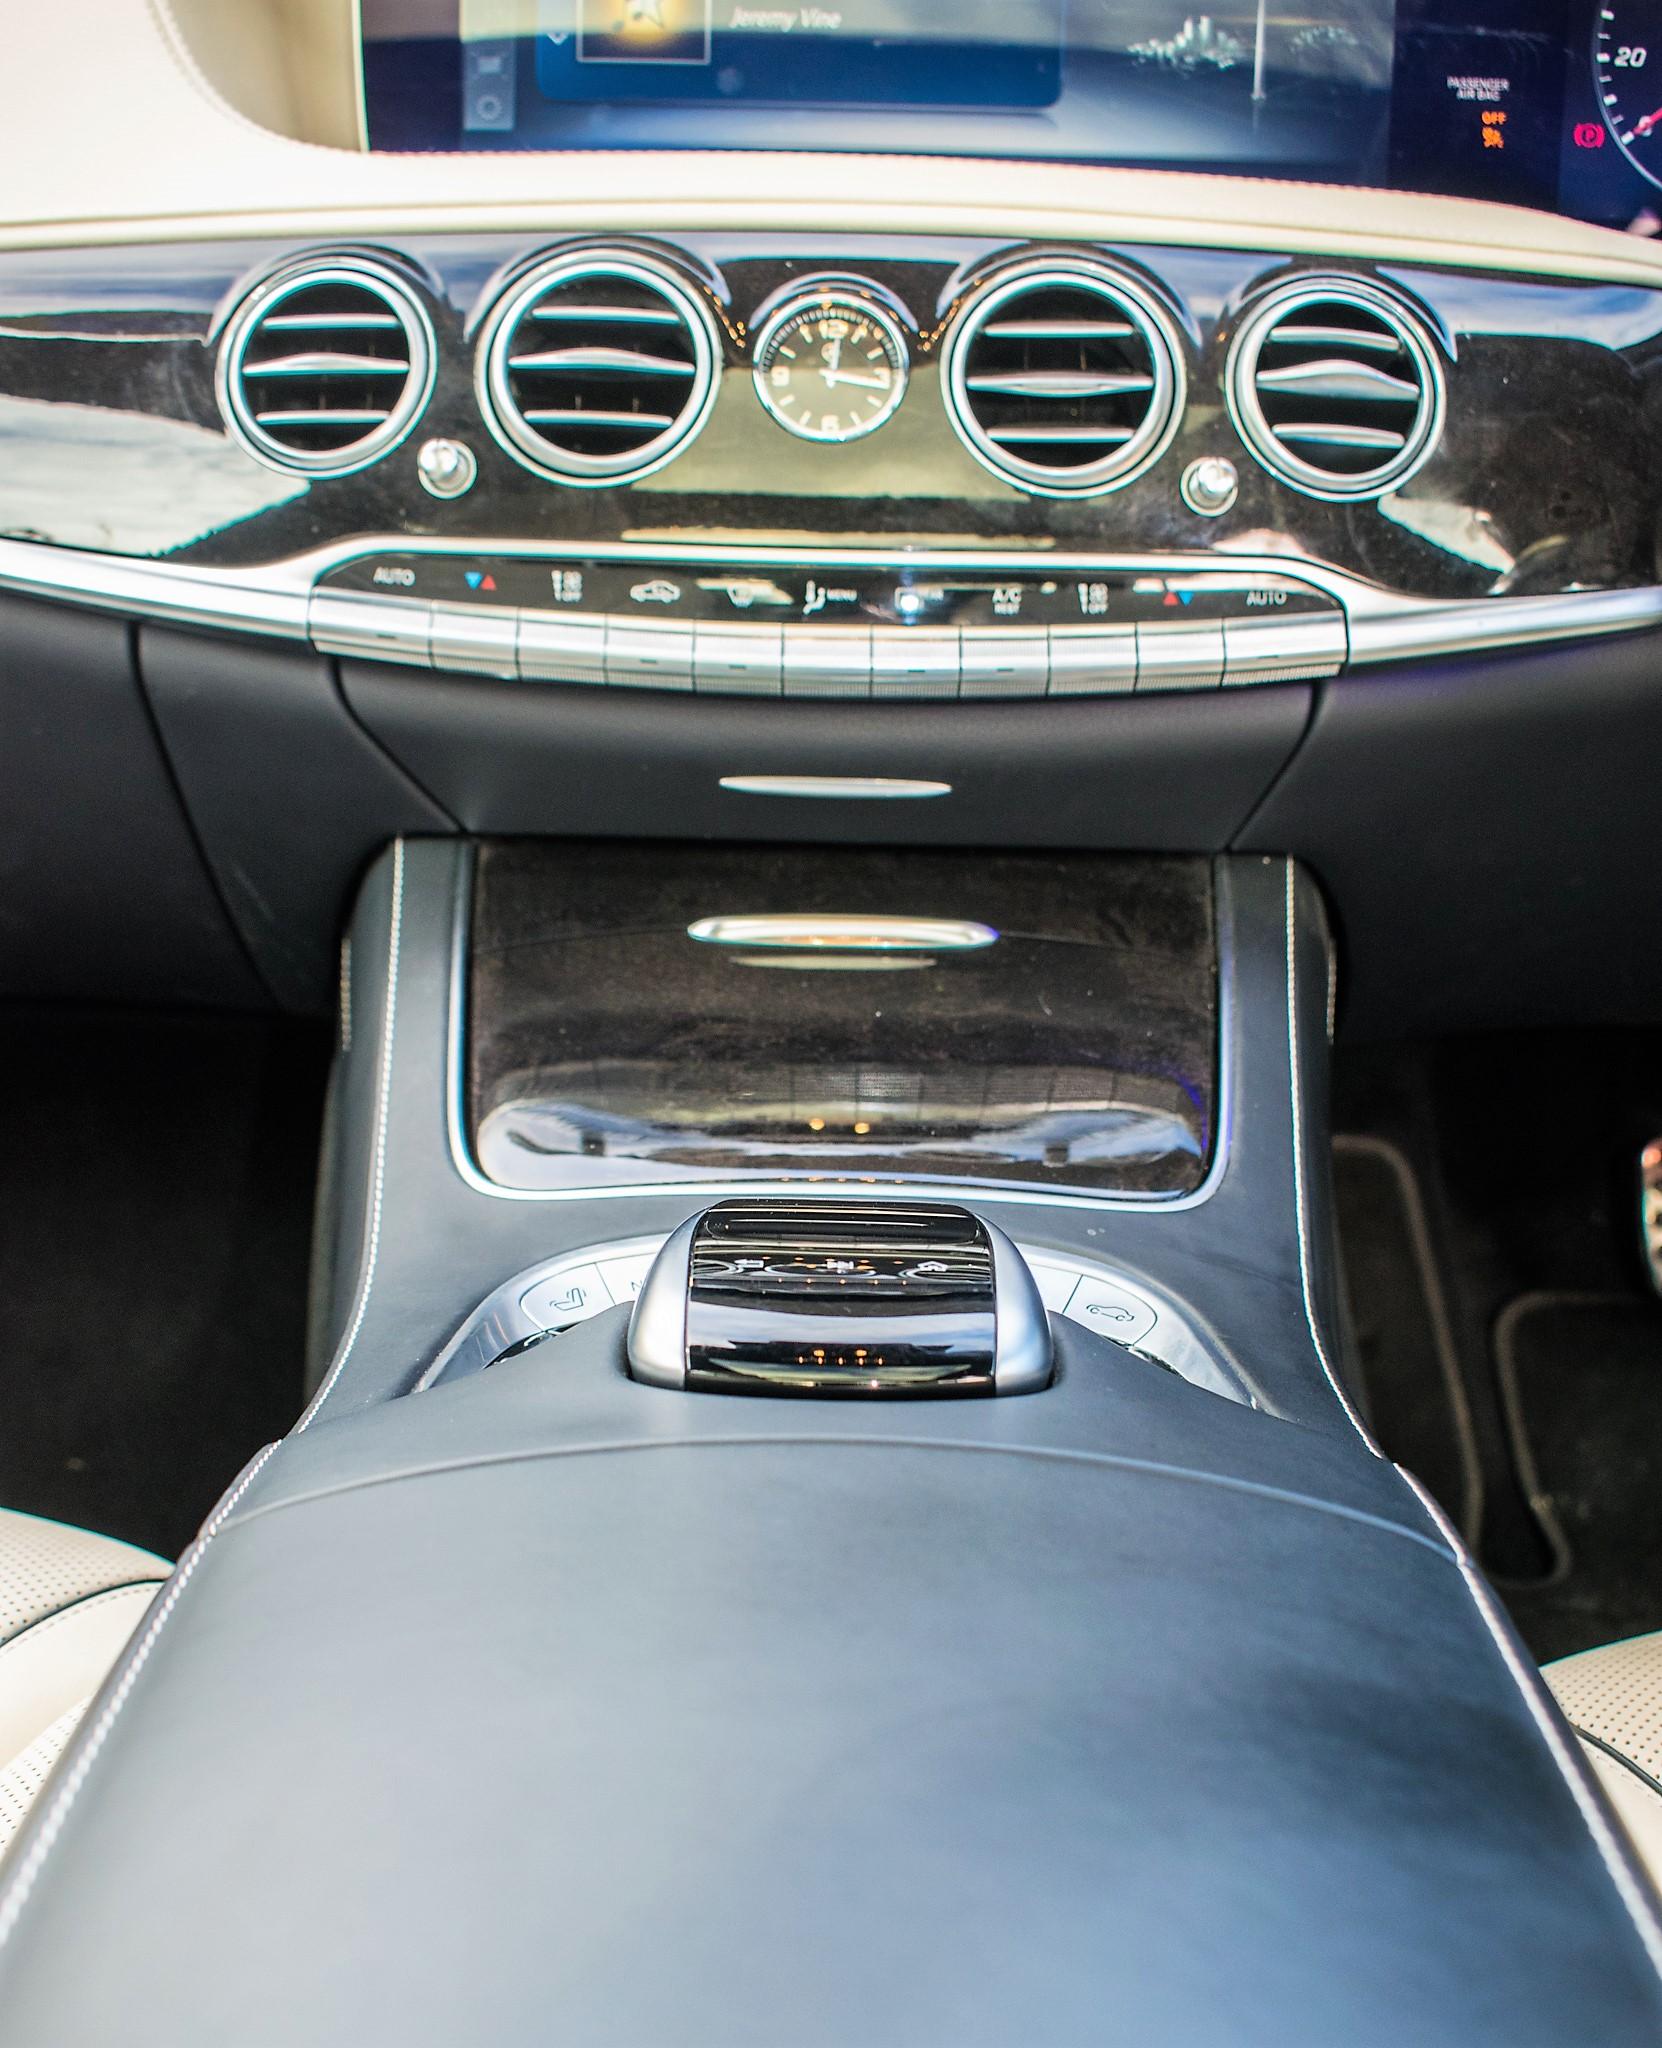 Mercedes Benz S450 L AMG Line Executive auto petrol 4 door saloon car Registration Number: FX68 - Image 29 of 30